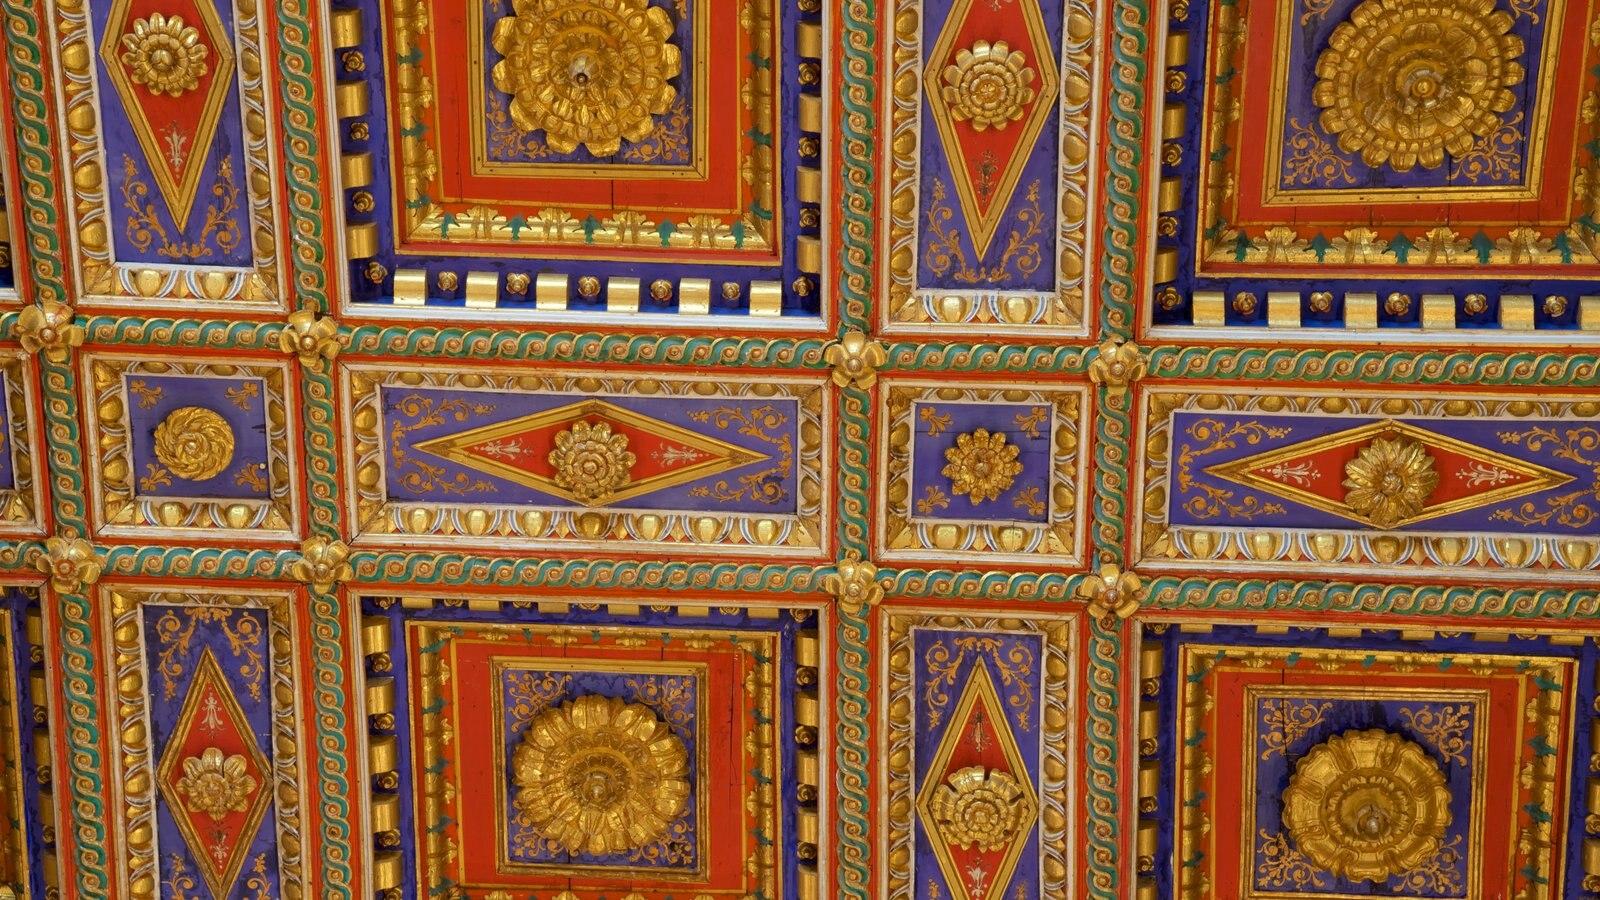 Basilica San Pietro showing art